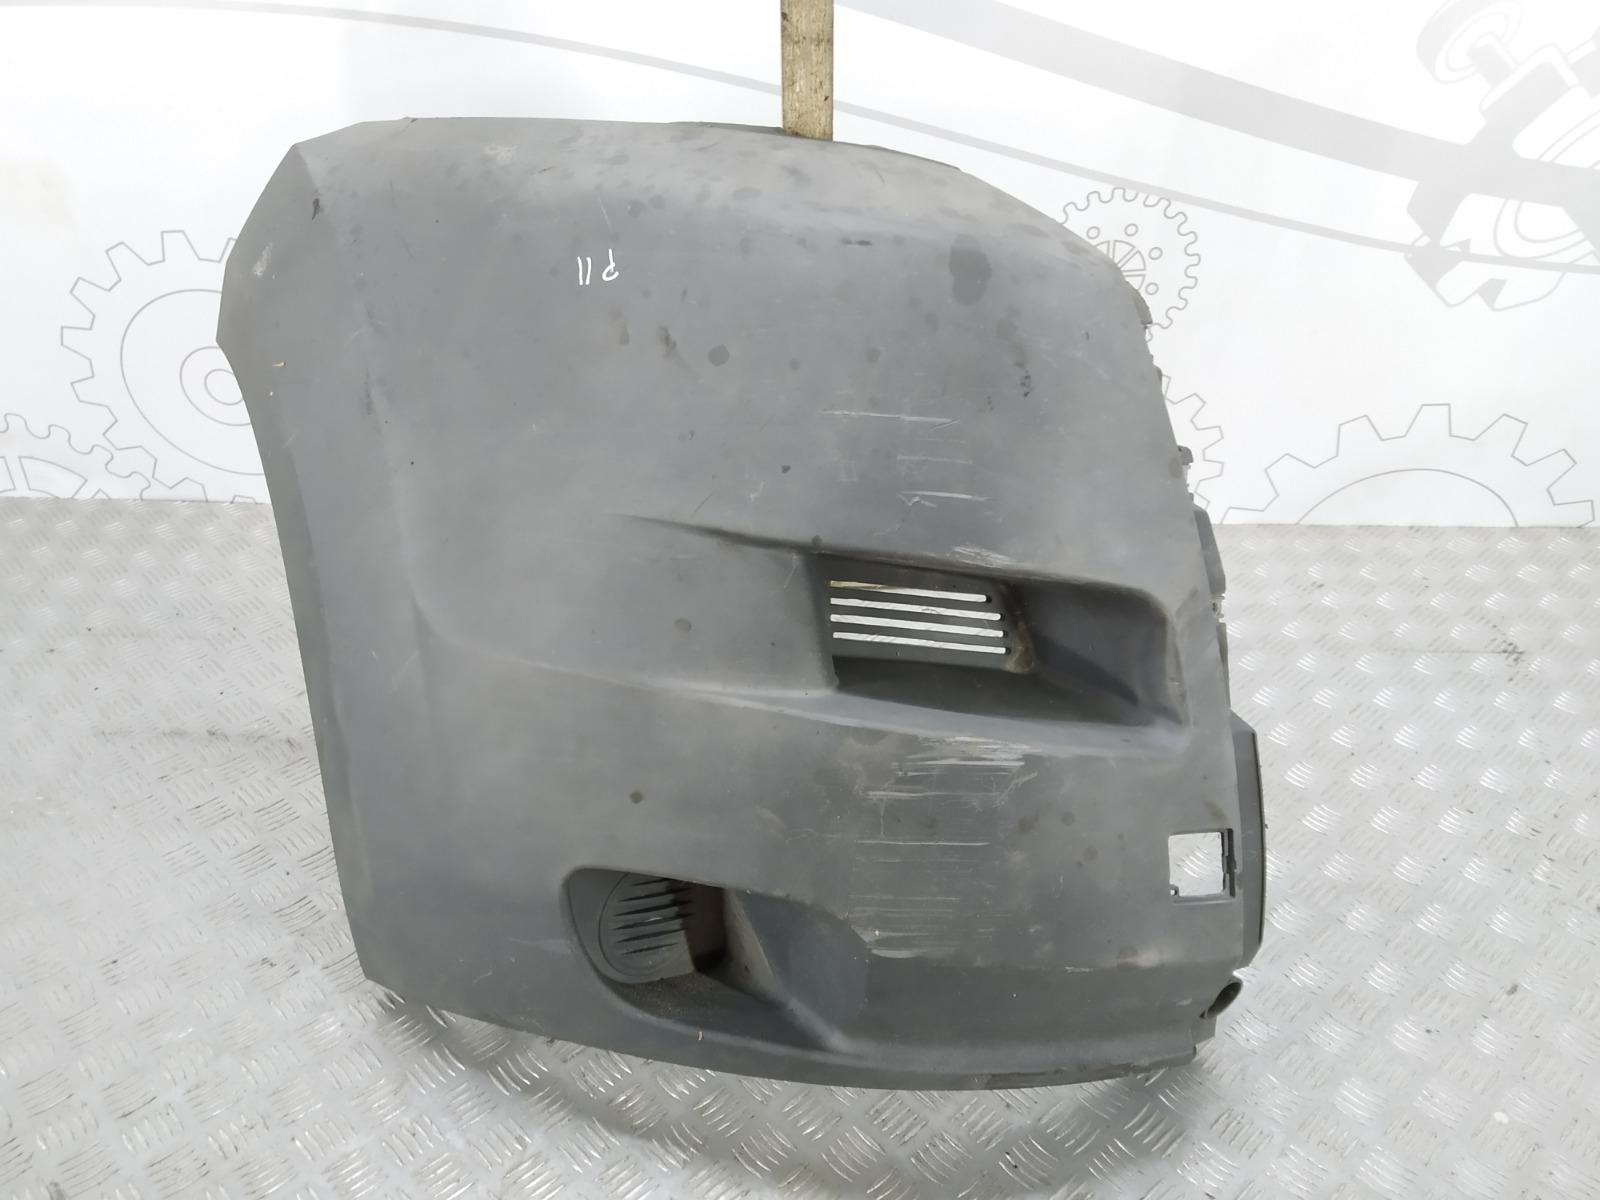 Клык бампера передний правый Citroen Jumper 2.2 HDI 2013 (б/у)